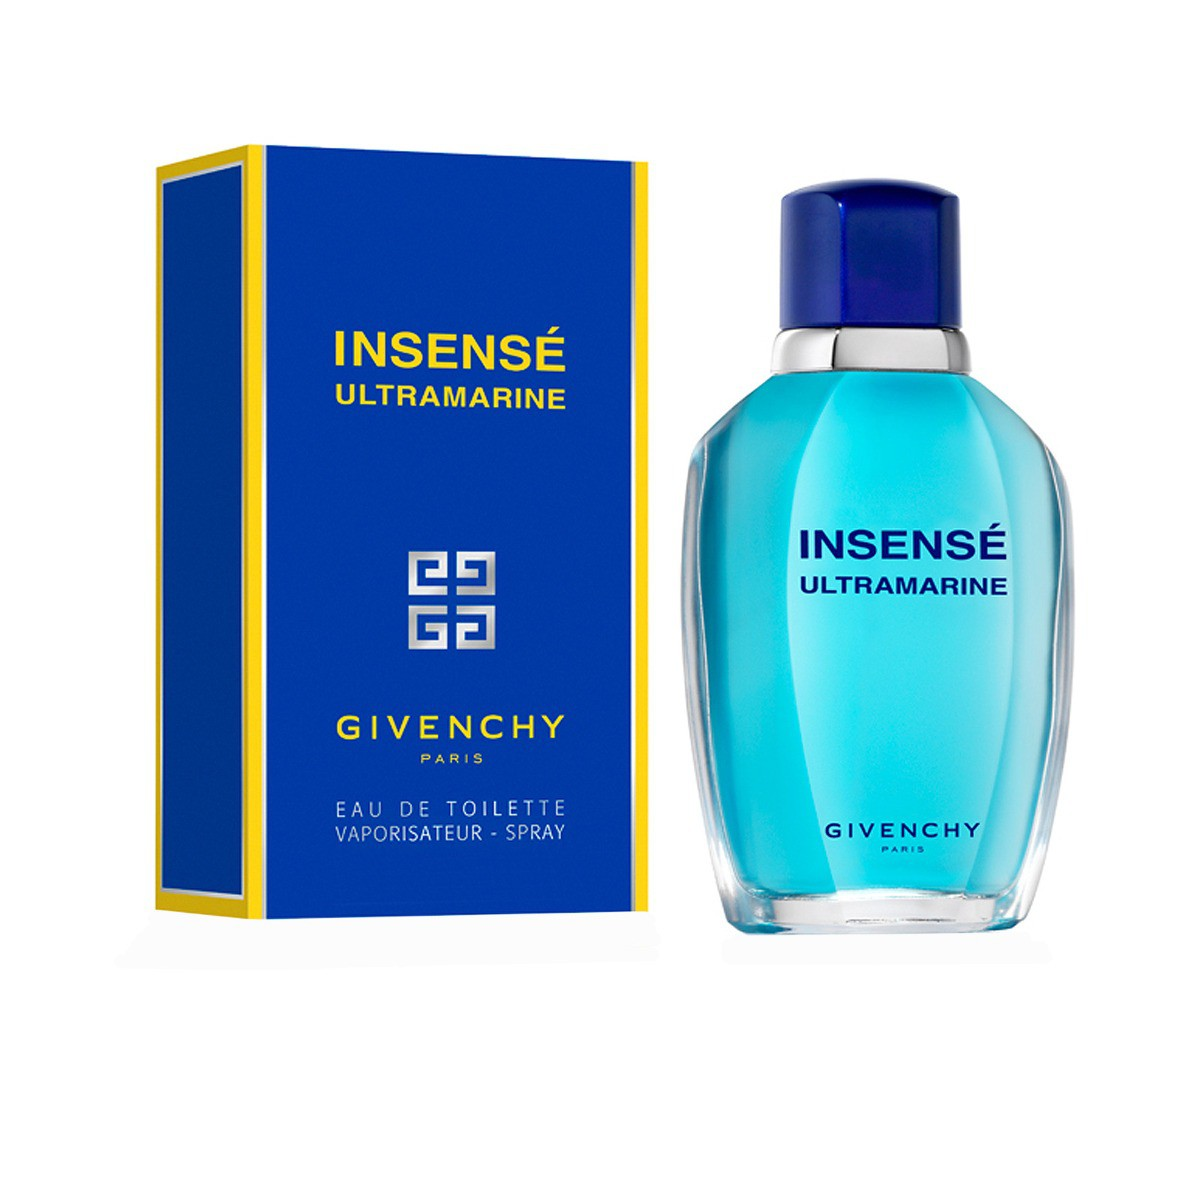 Givenchy Insensé Ultramarine аромат для мужчин